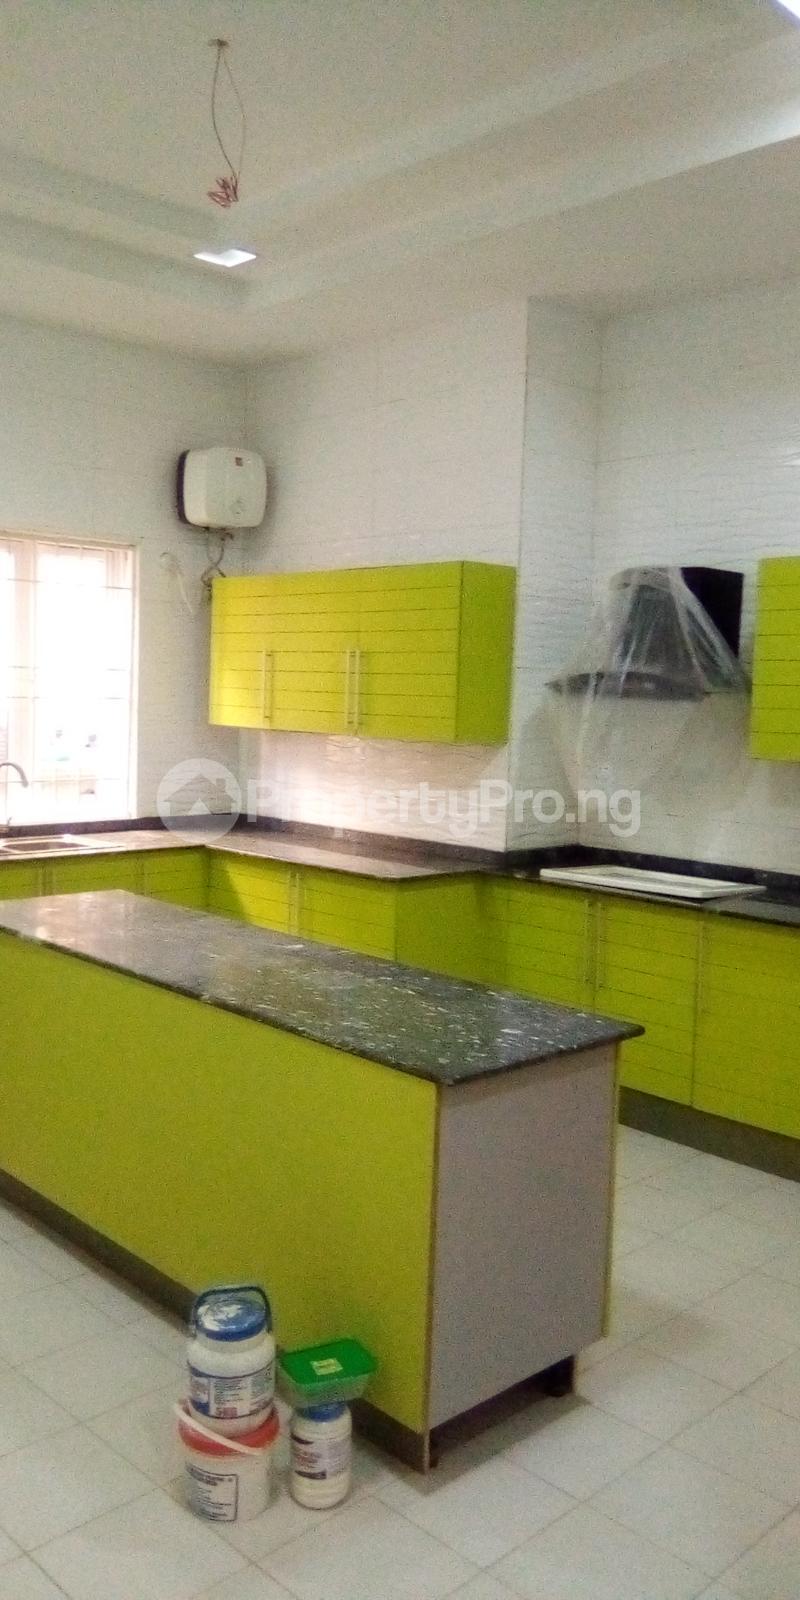 5 bedroom Detached Duplex for sale Southern View Oral Estate Lekki Lagos - 3